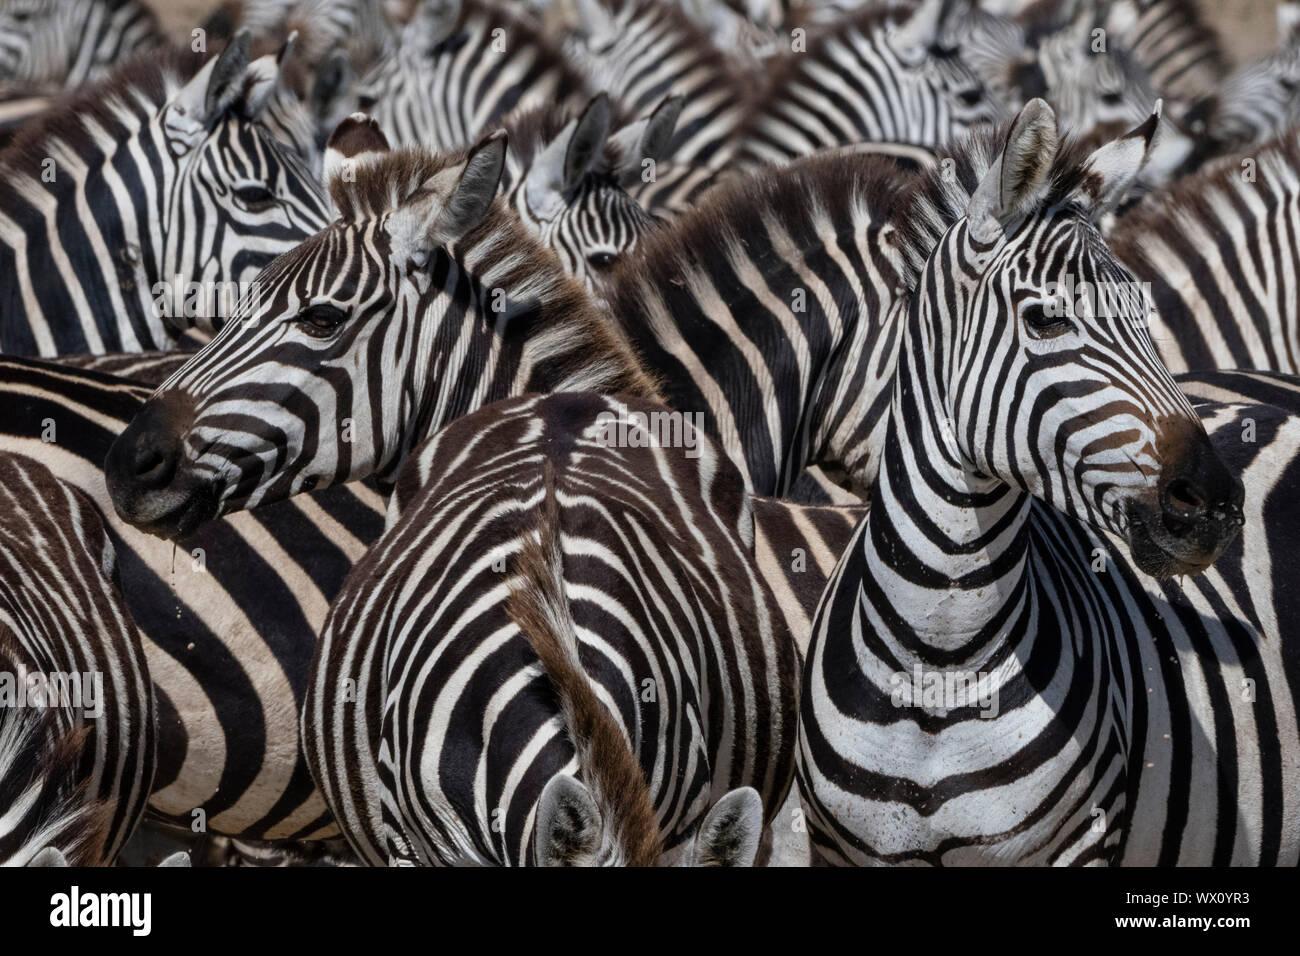 Eine Herde von ebenen Zebras (Equus quagga) im Hidden Valley, Tansania, Ostafrika, Südafrika Stockfoto